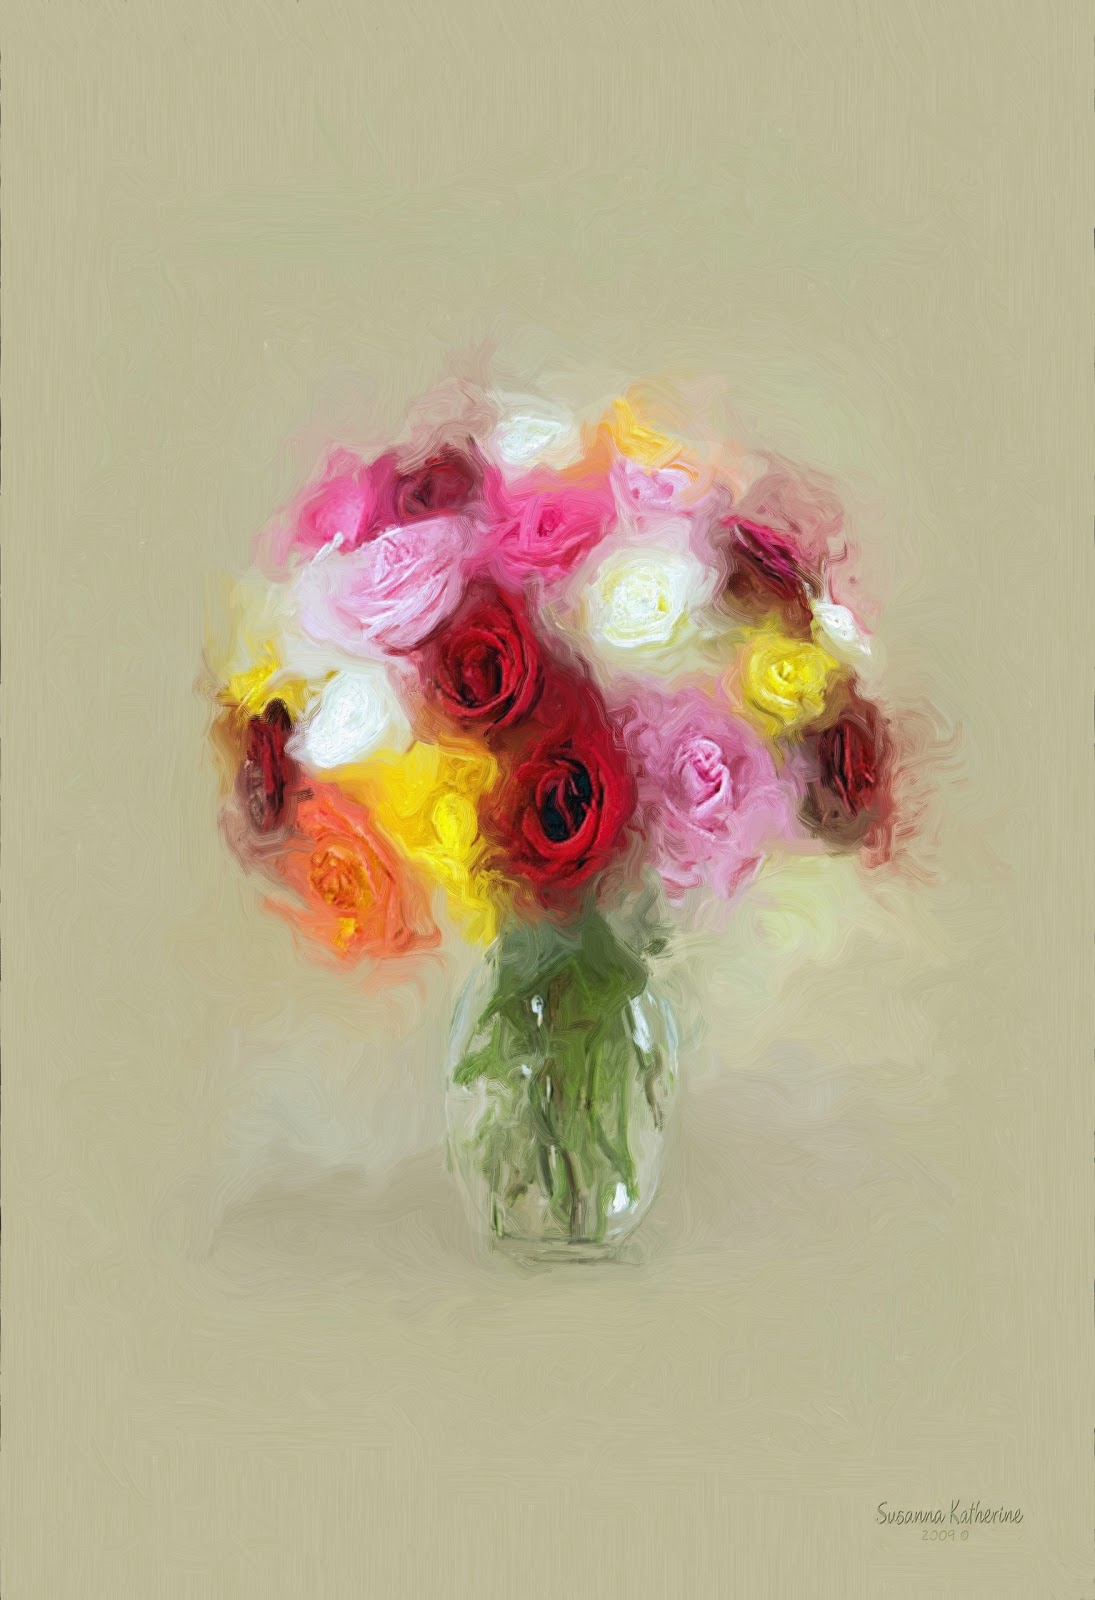 Of artists original unusual art rose flowers in a clear vase